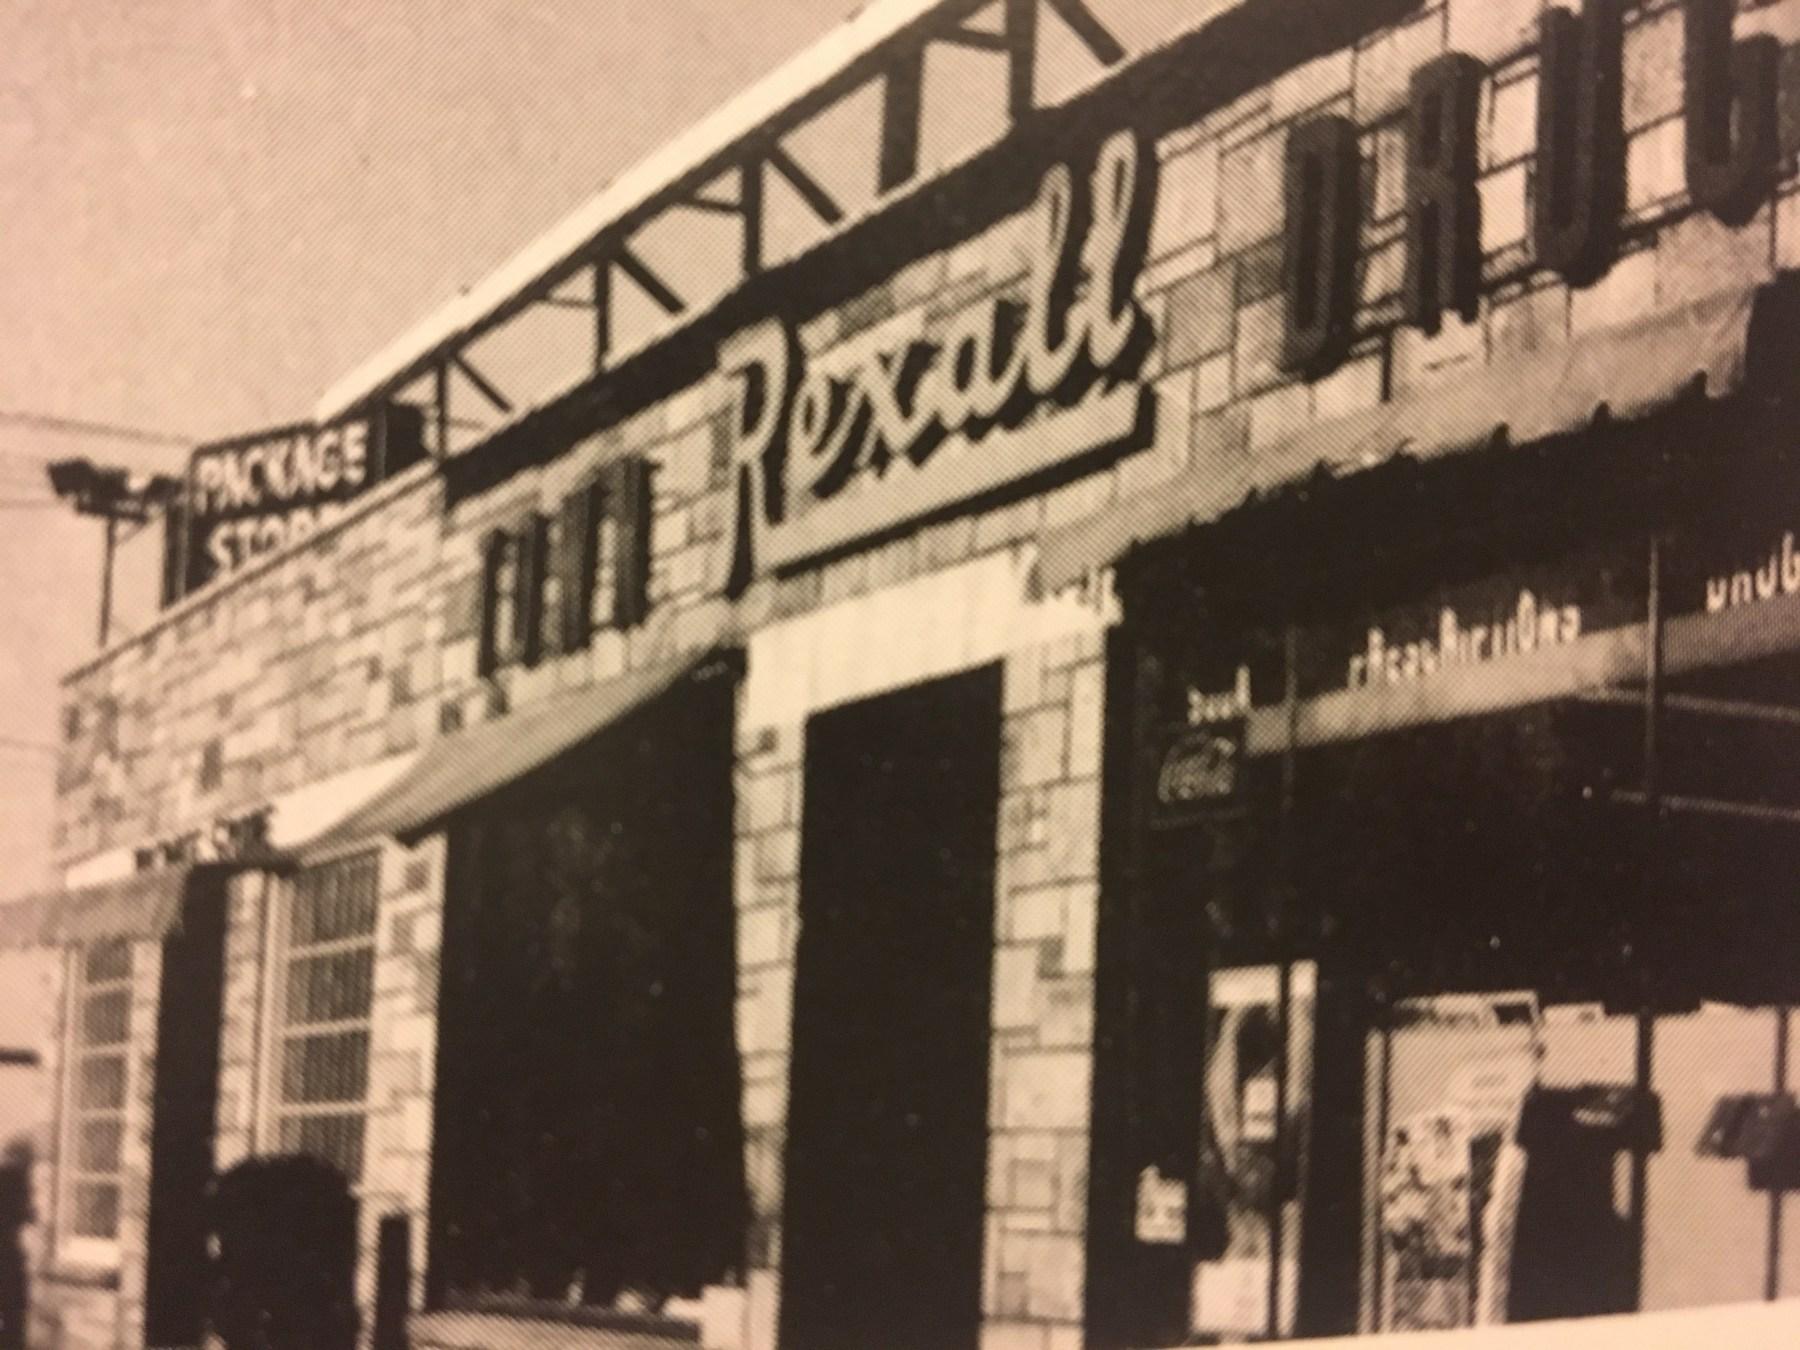 Rexall storefront full